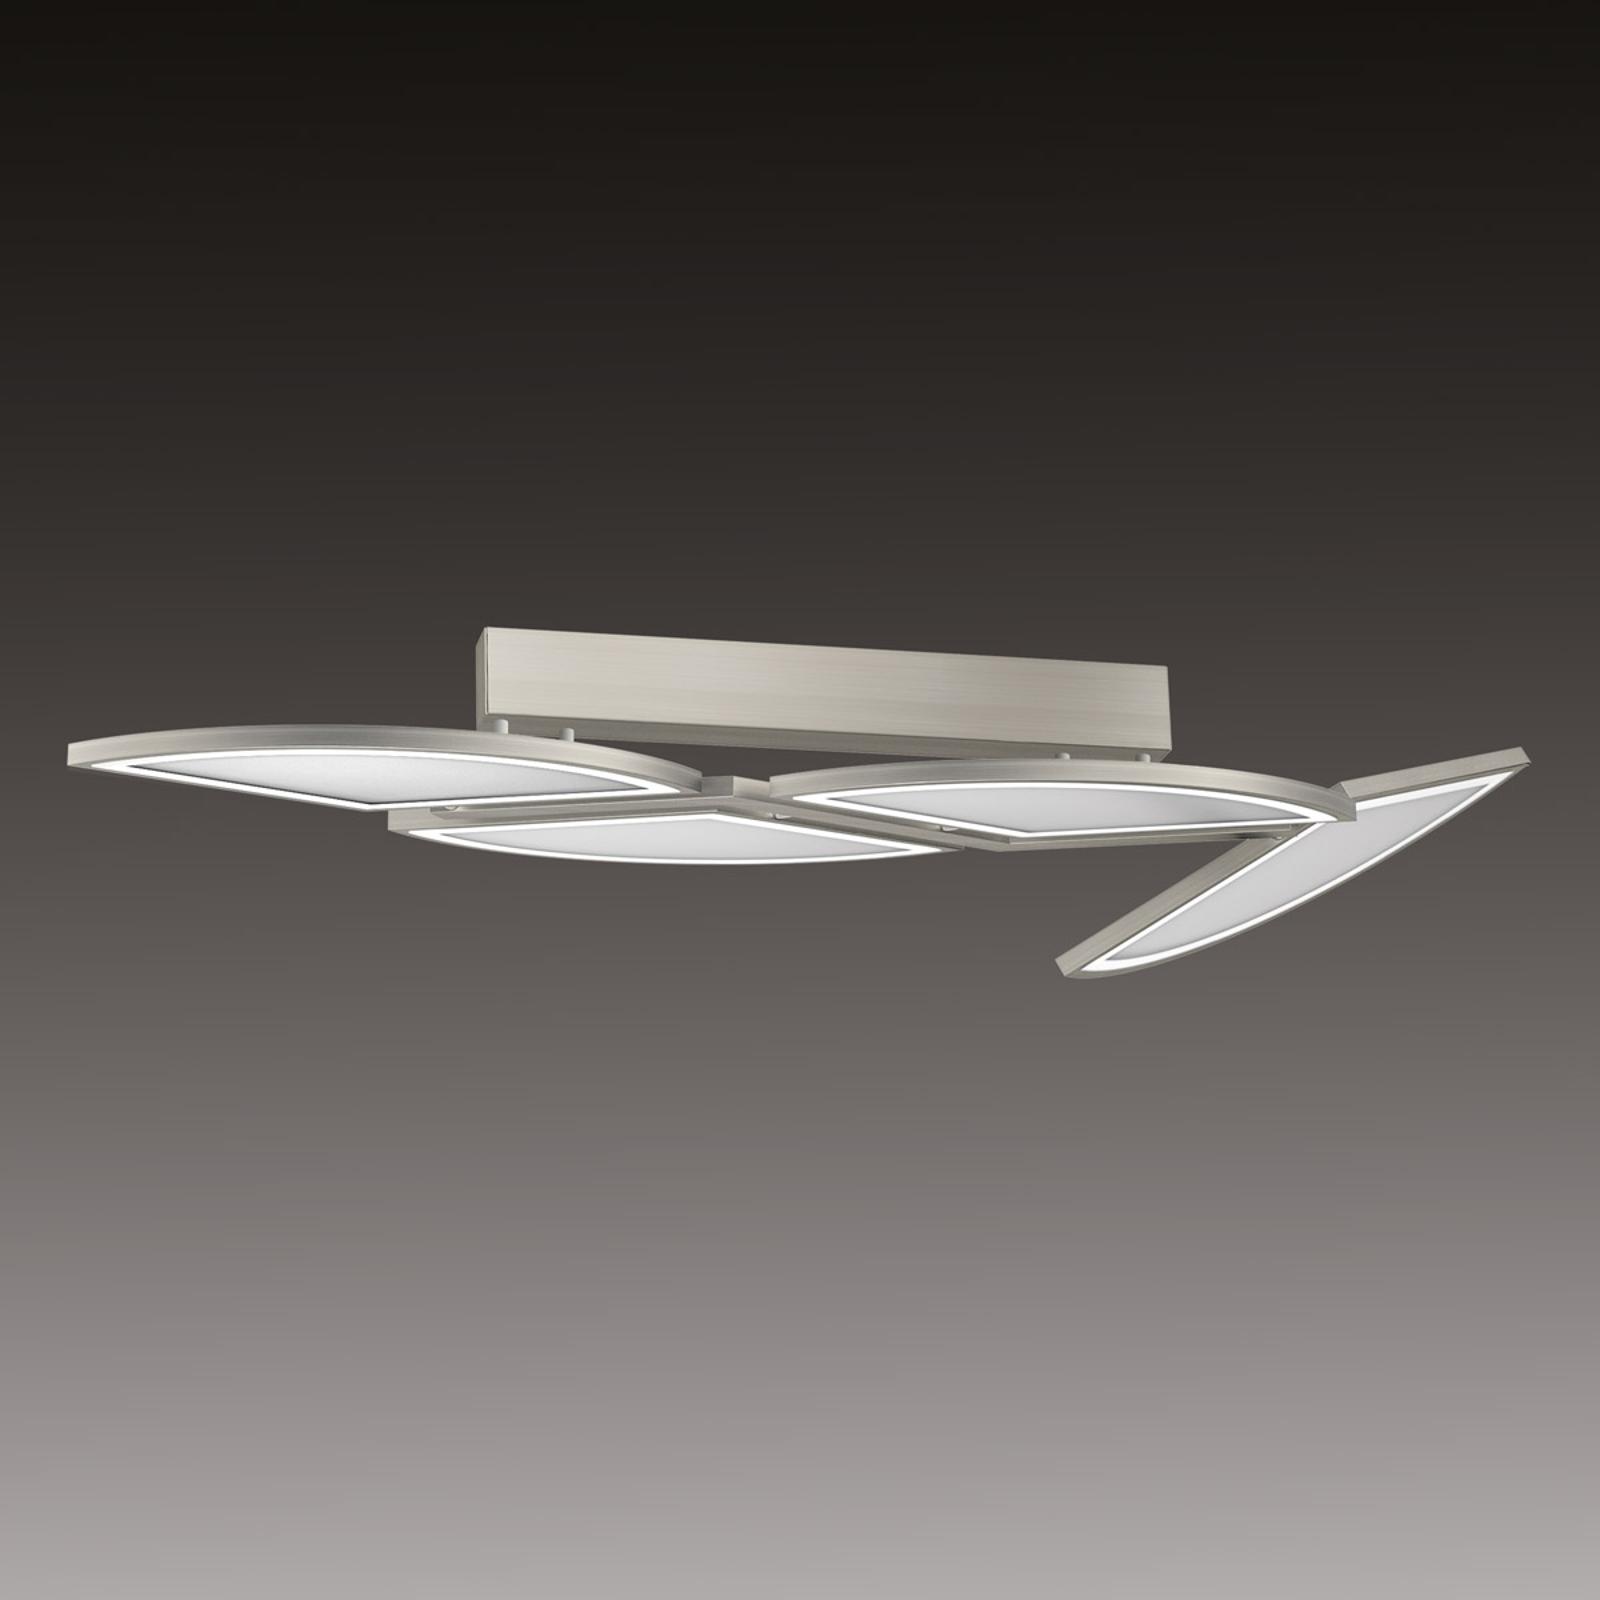 Plafonnier LED Movil avec 4 segments lumineux